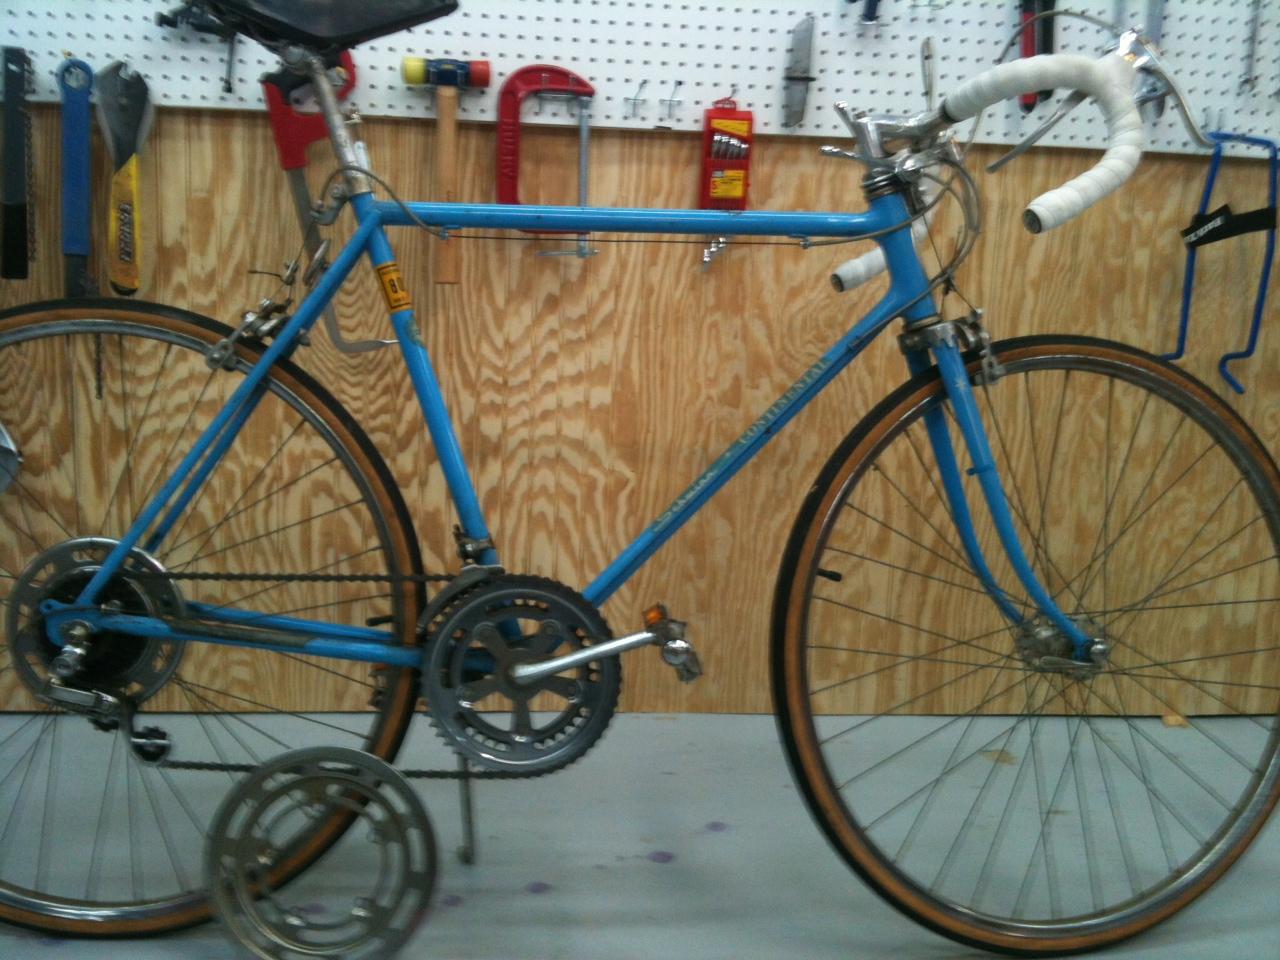 John's Bicycle Restorations: 1973 Schwinn Continental Restoration